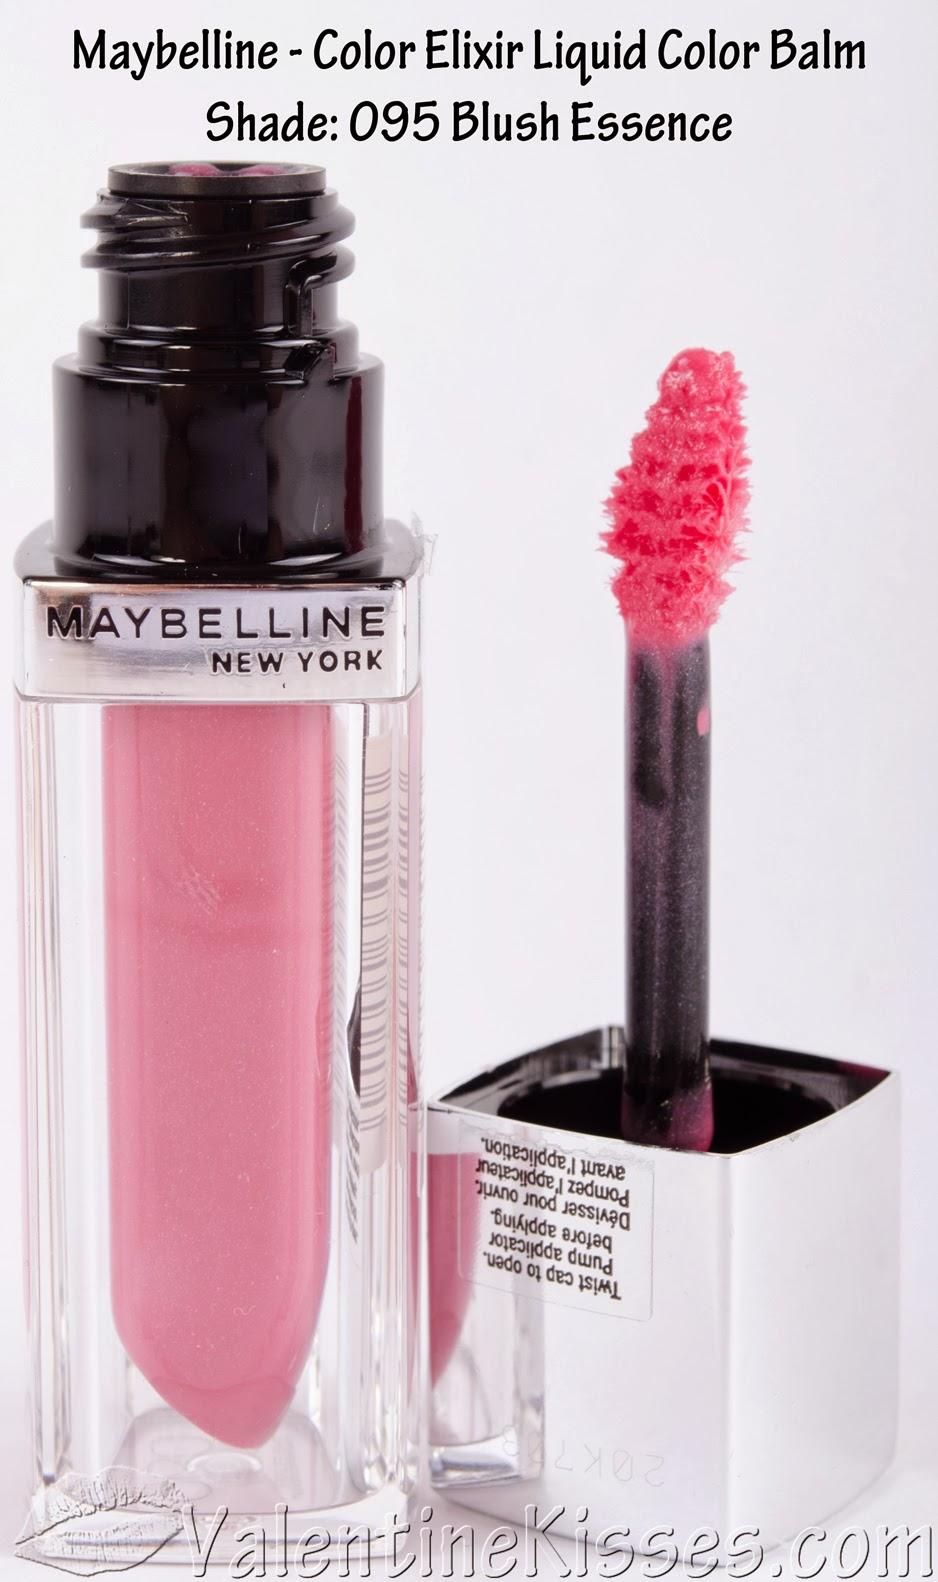 Maybelline Color Show Nail Art Masterclass: Valentine Kisses: Maybelline Color Elixir Liquid Color